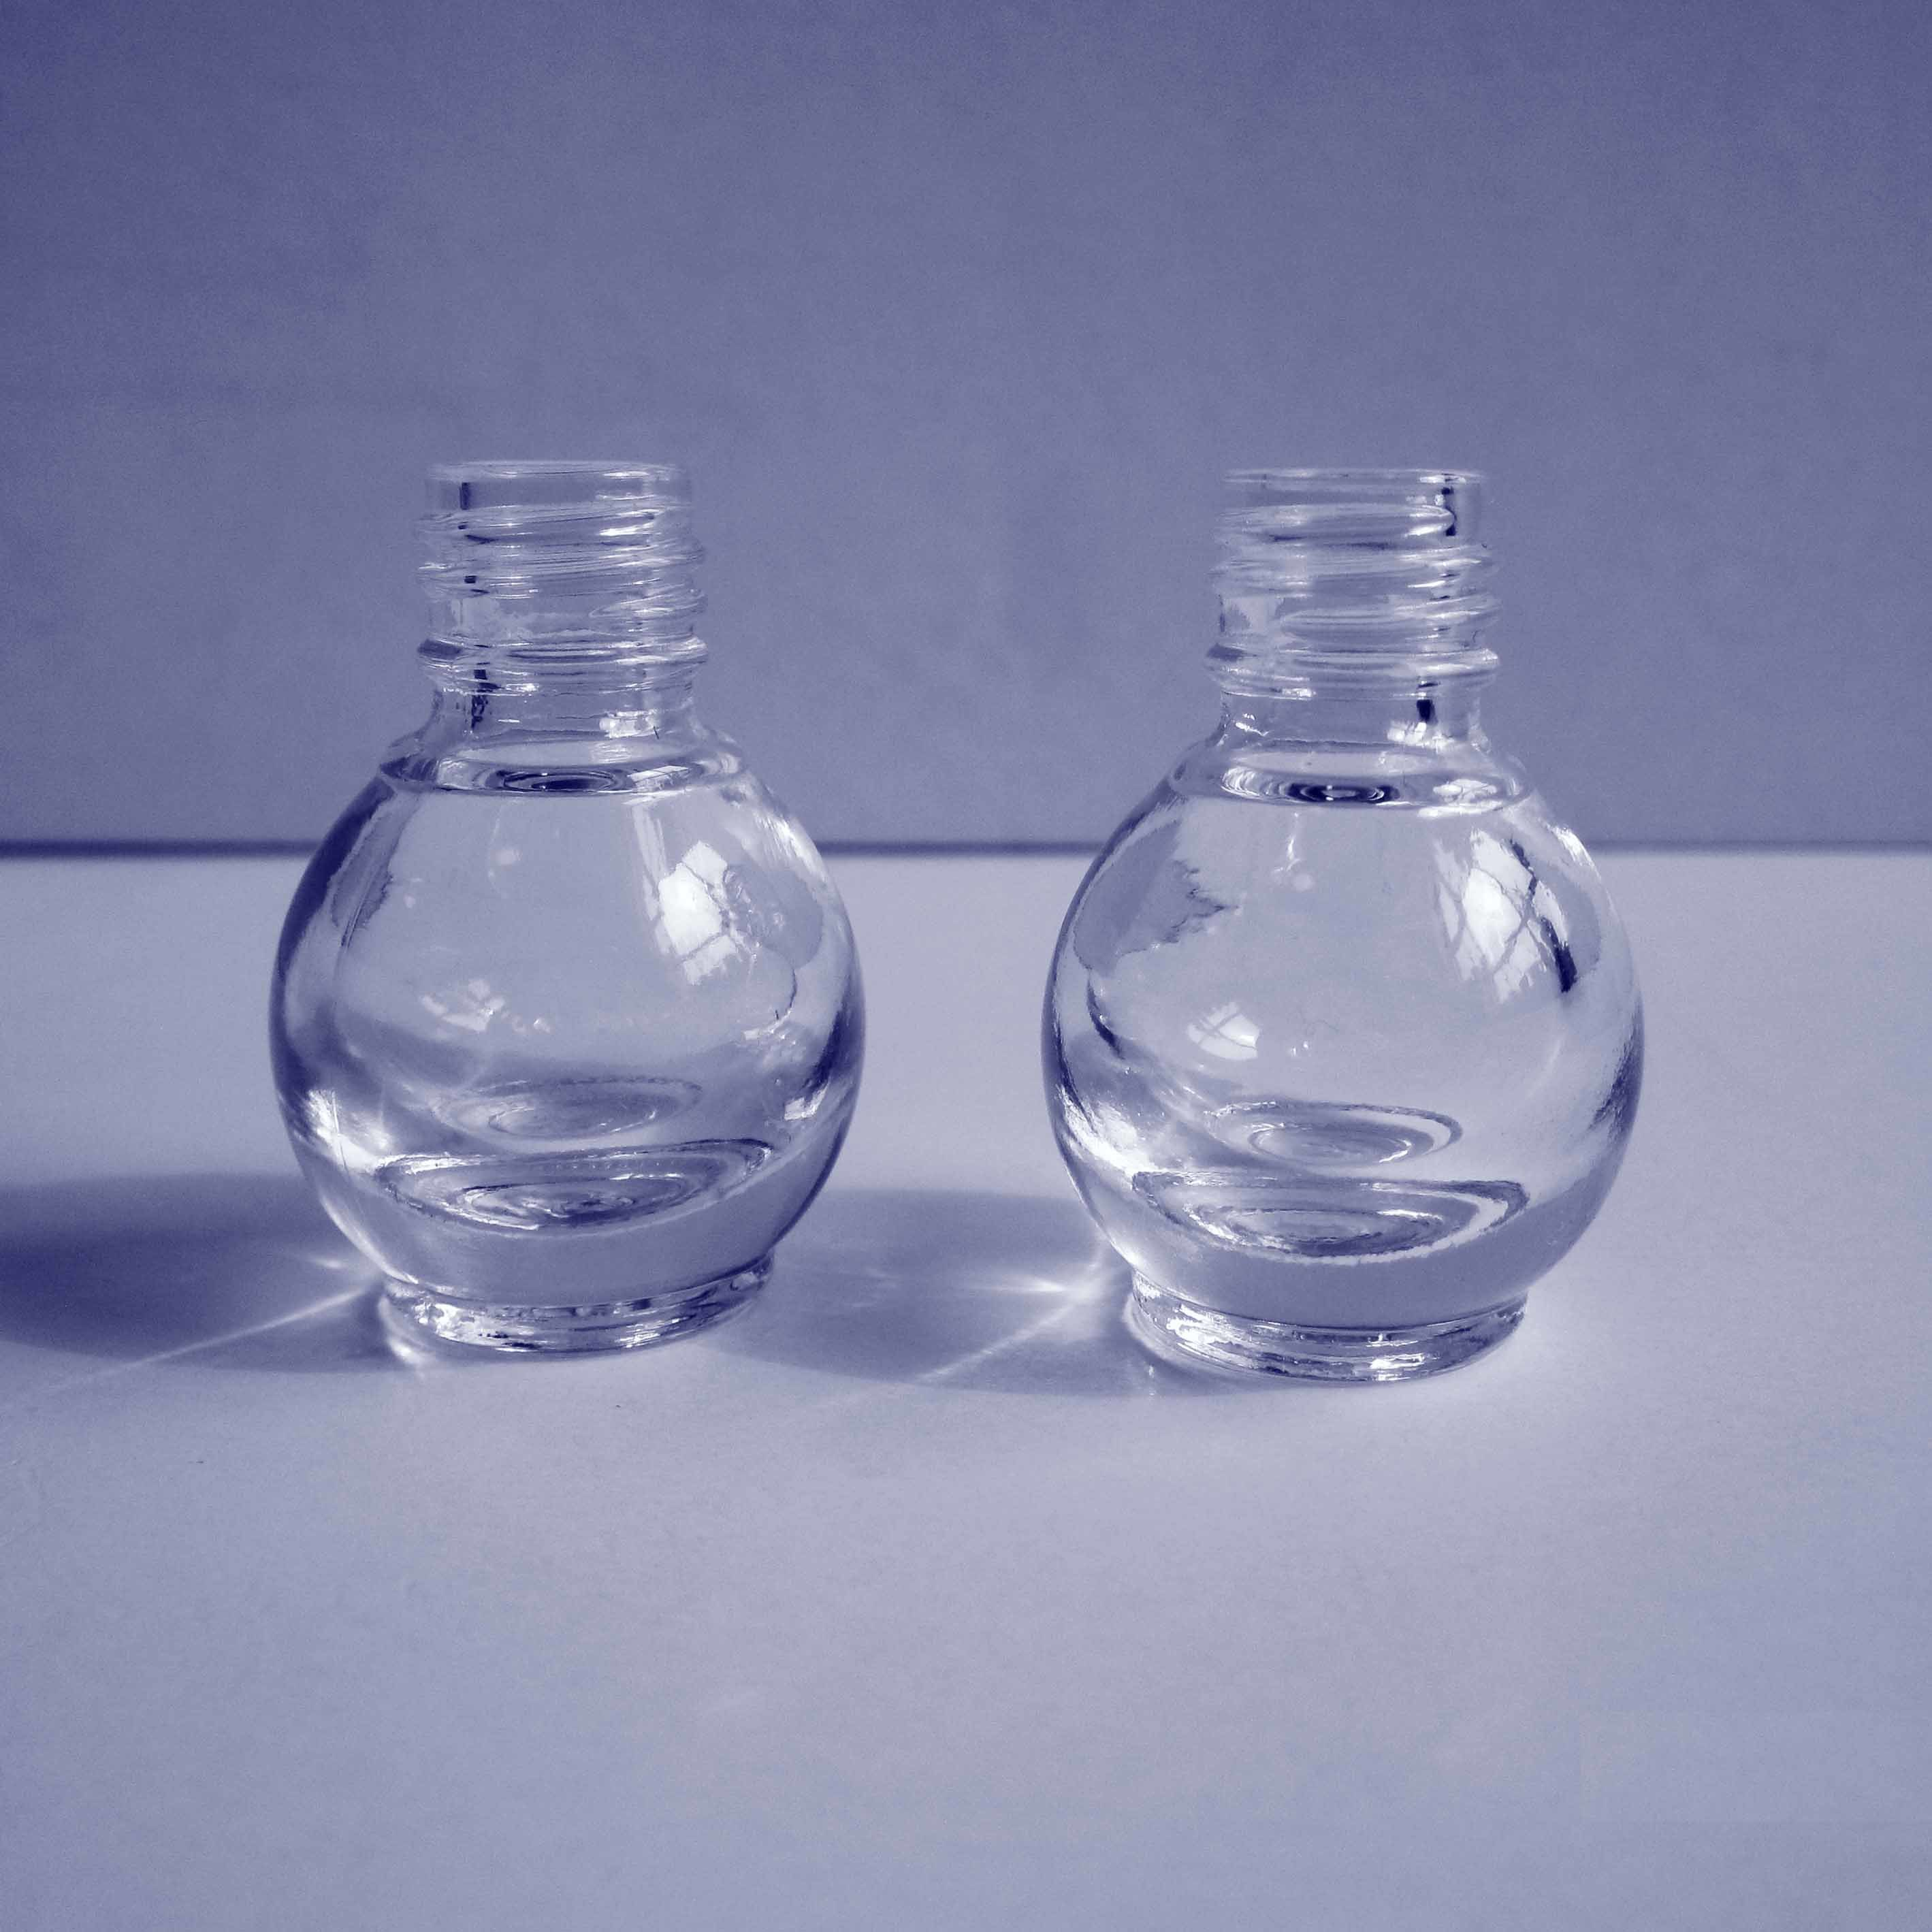 petite bouteille en verre ronde de vernis ongles. Black Bedroom Furniture Sets. Home Design Ideas